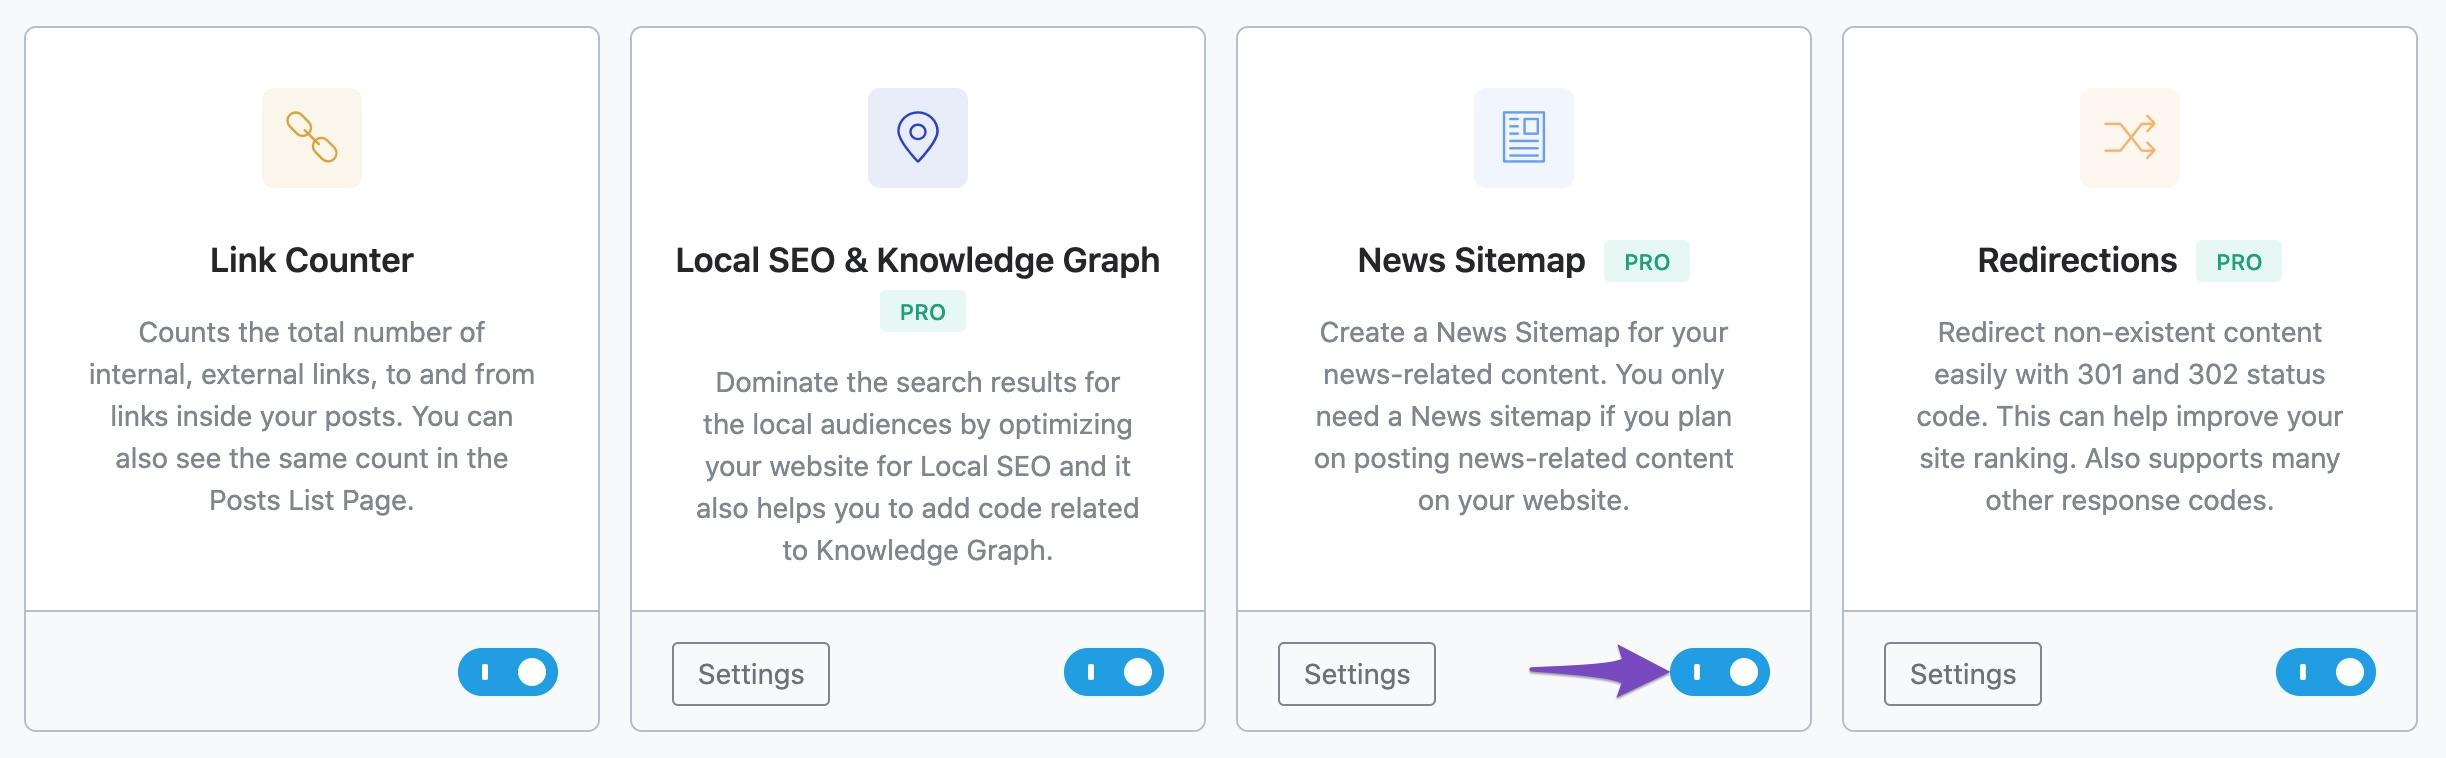 Enabling News Sitemap module